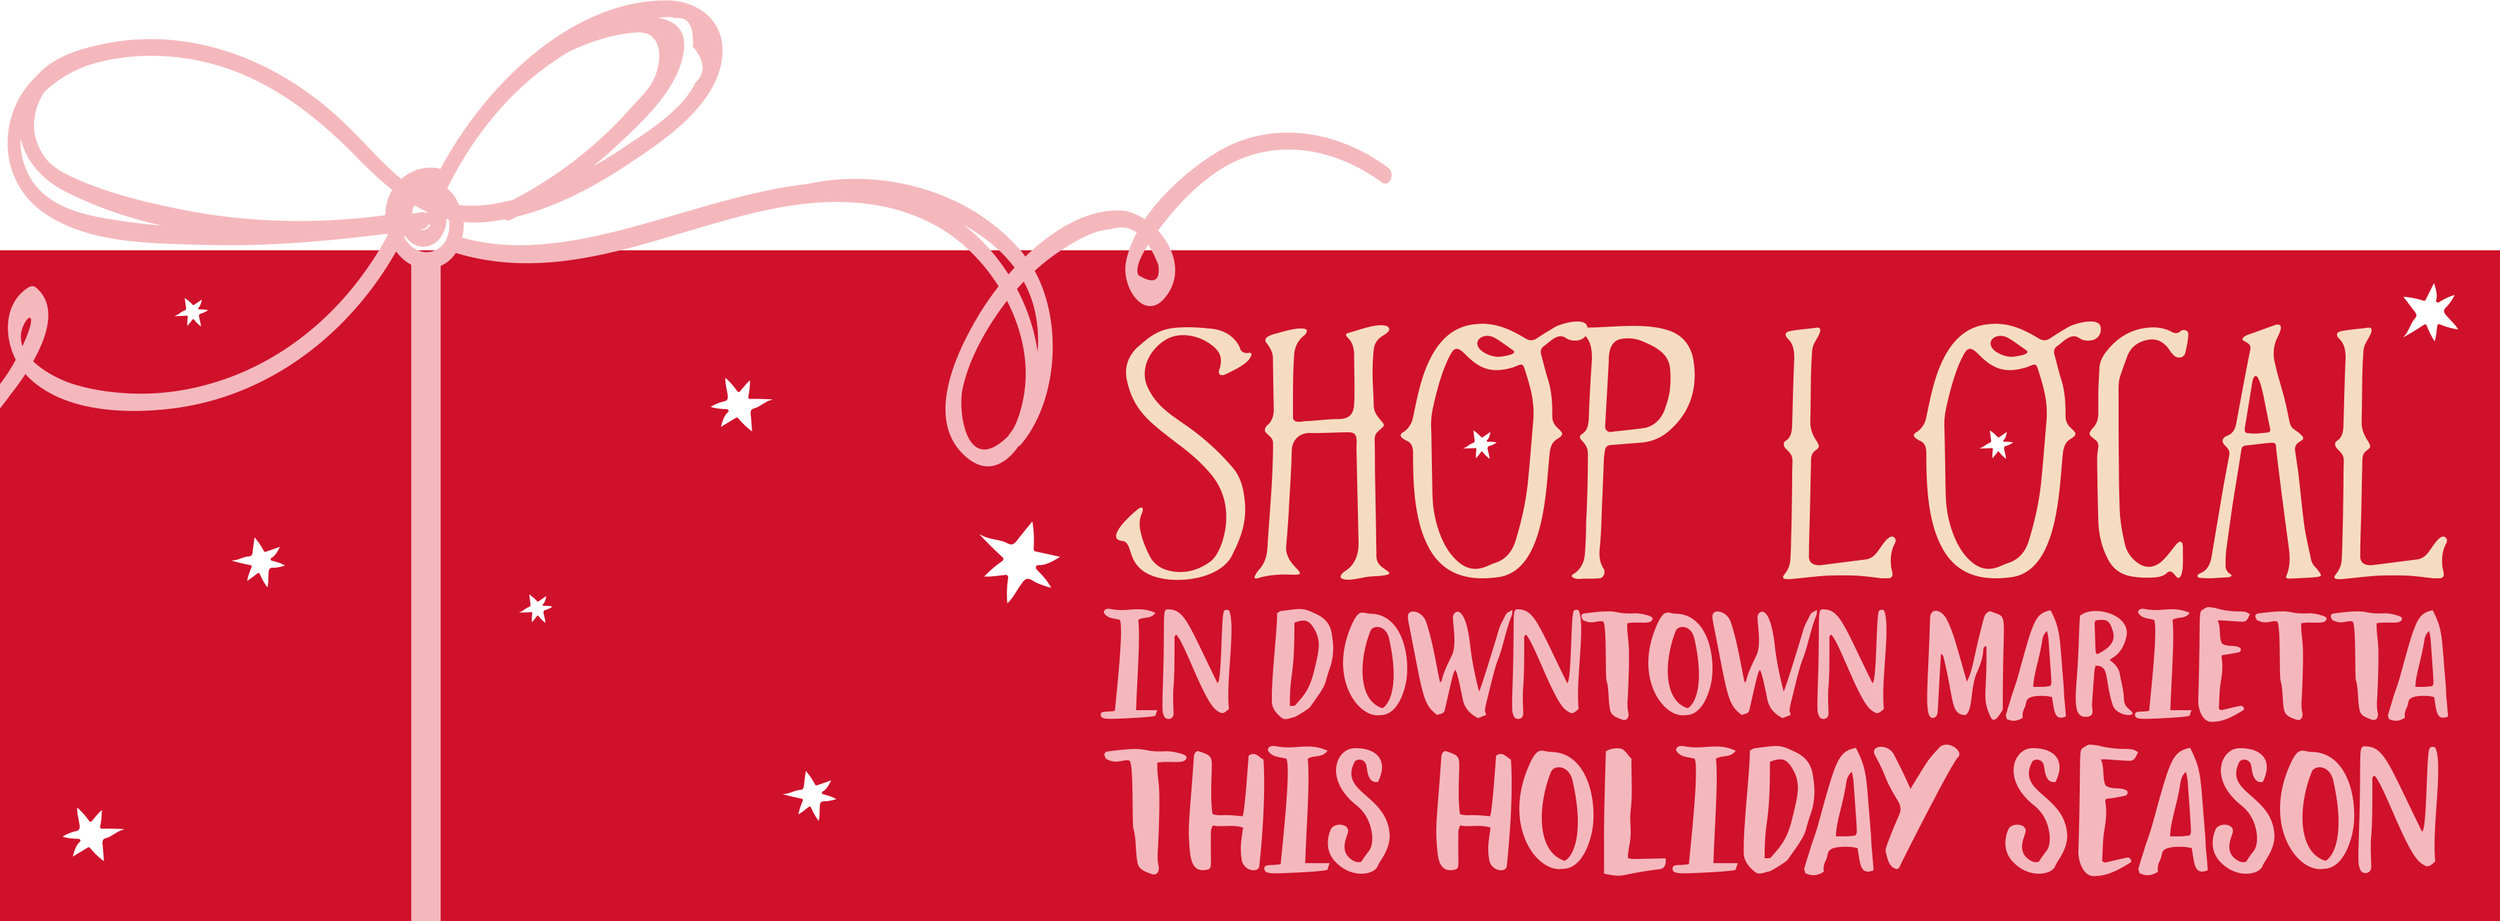 shop local cover.jpg